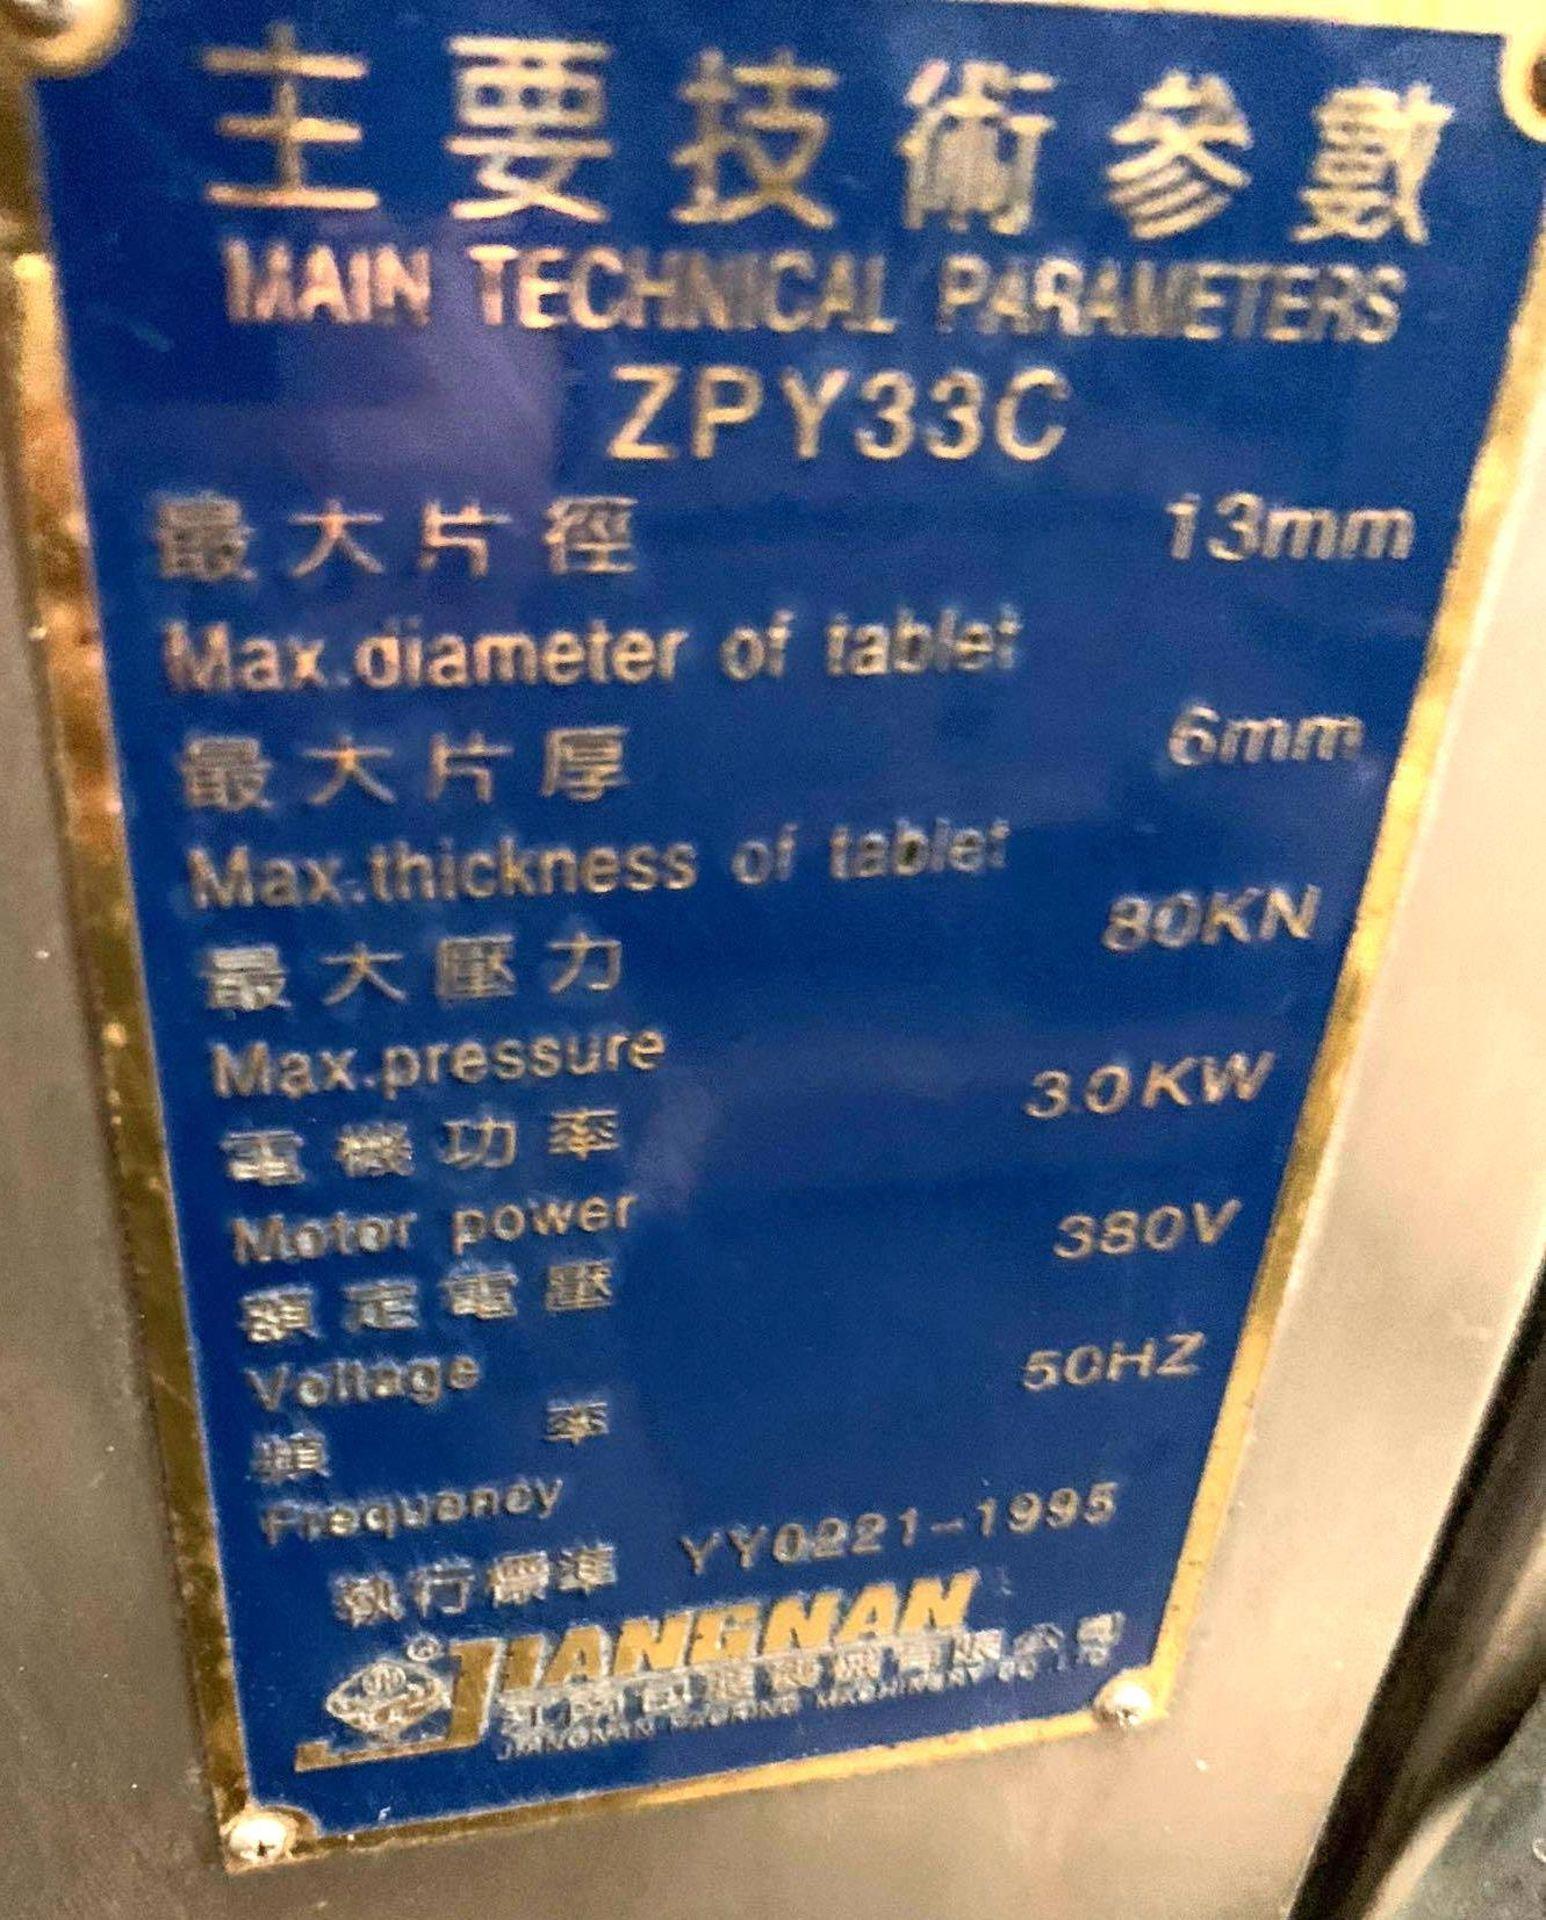 Jiansnan Tablet Press - Image 9 of 9